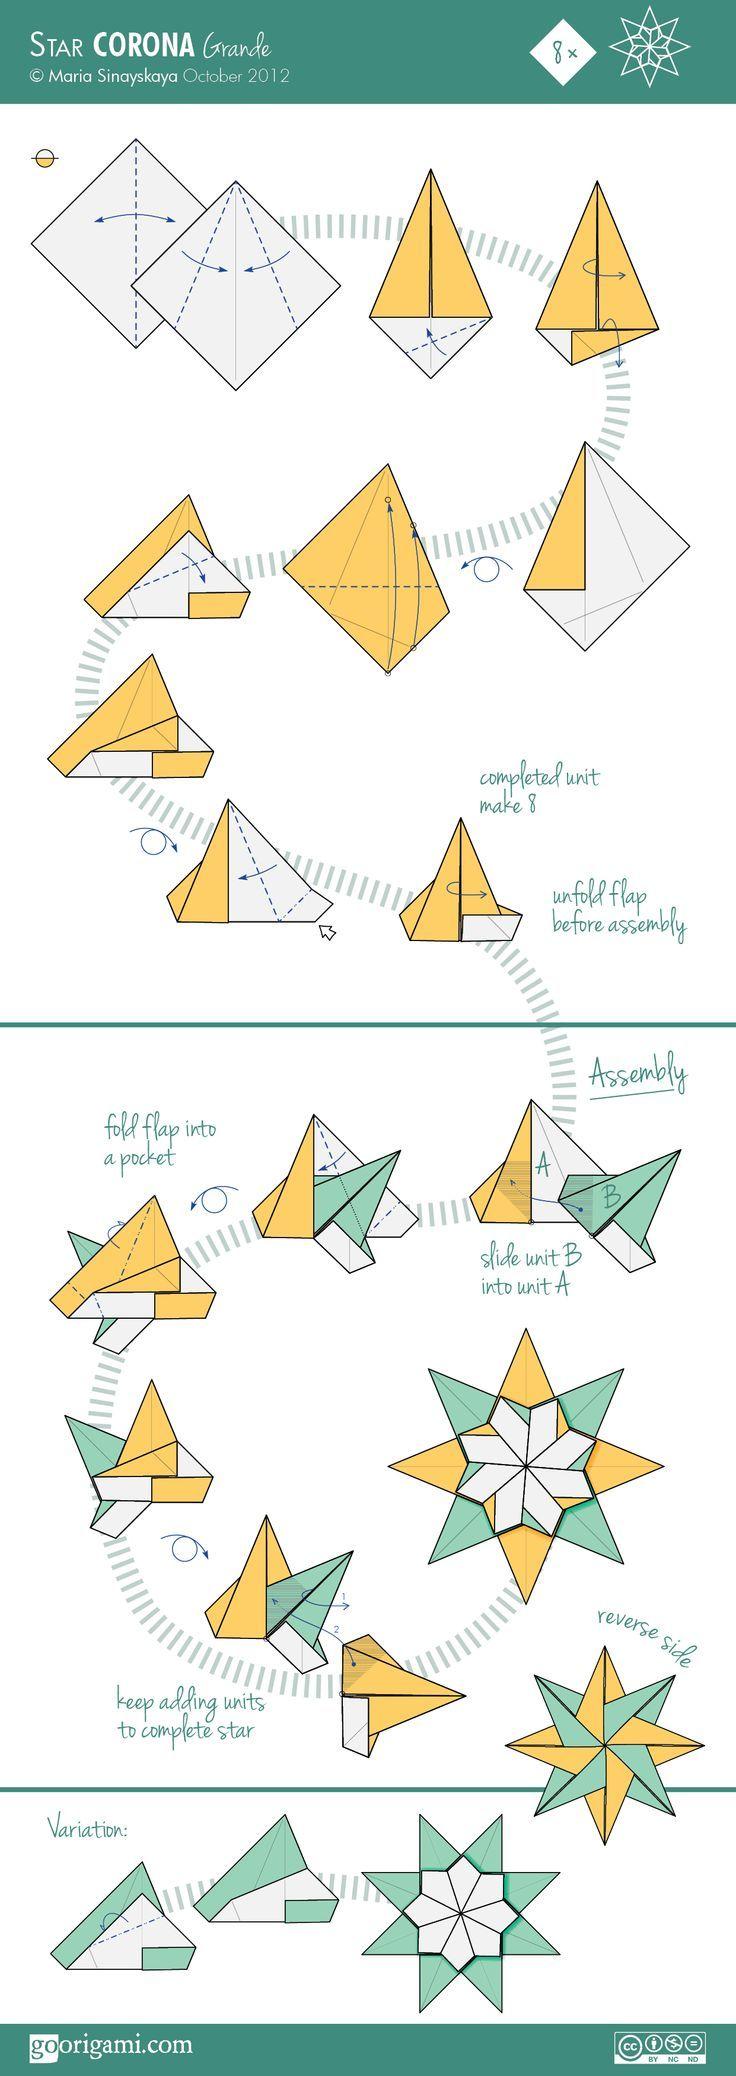 Star Corona Grande Diagram Easy To Follow Origami Directions Fireworks